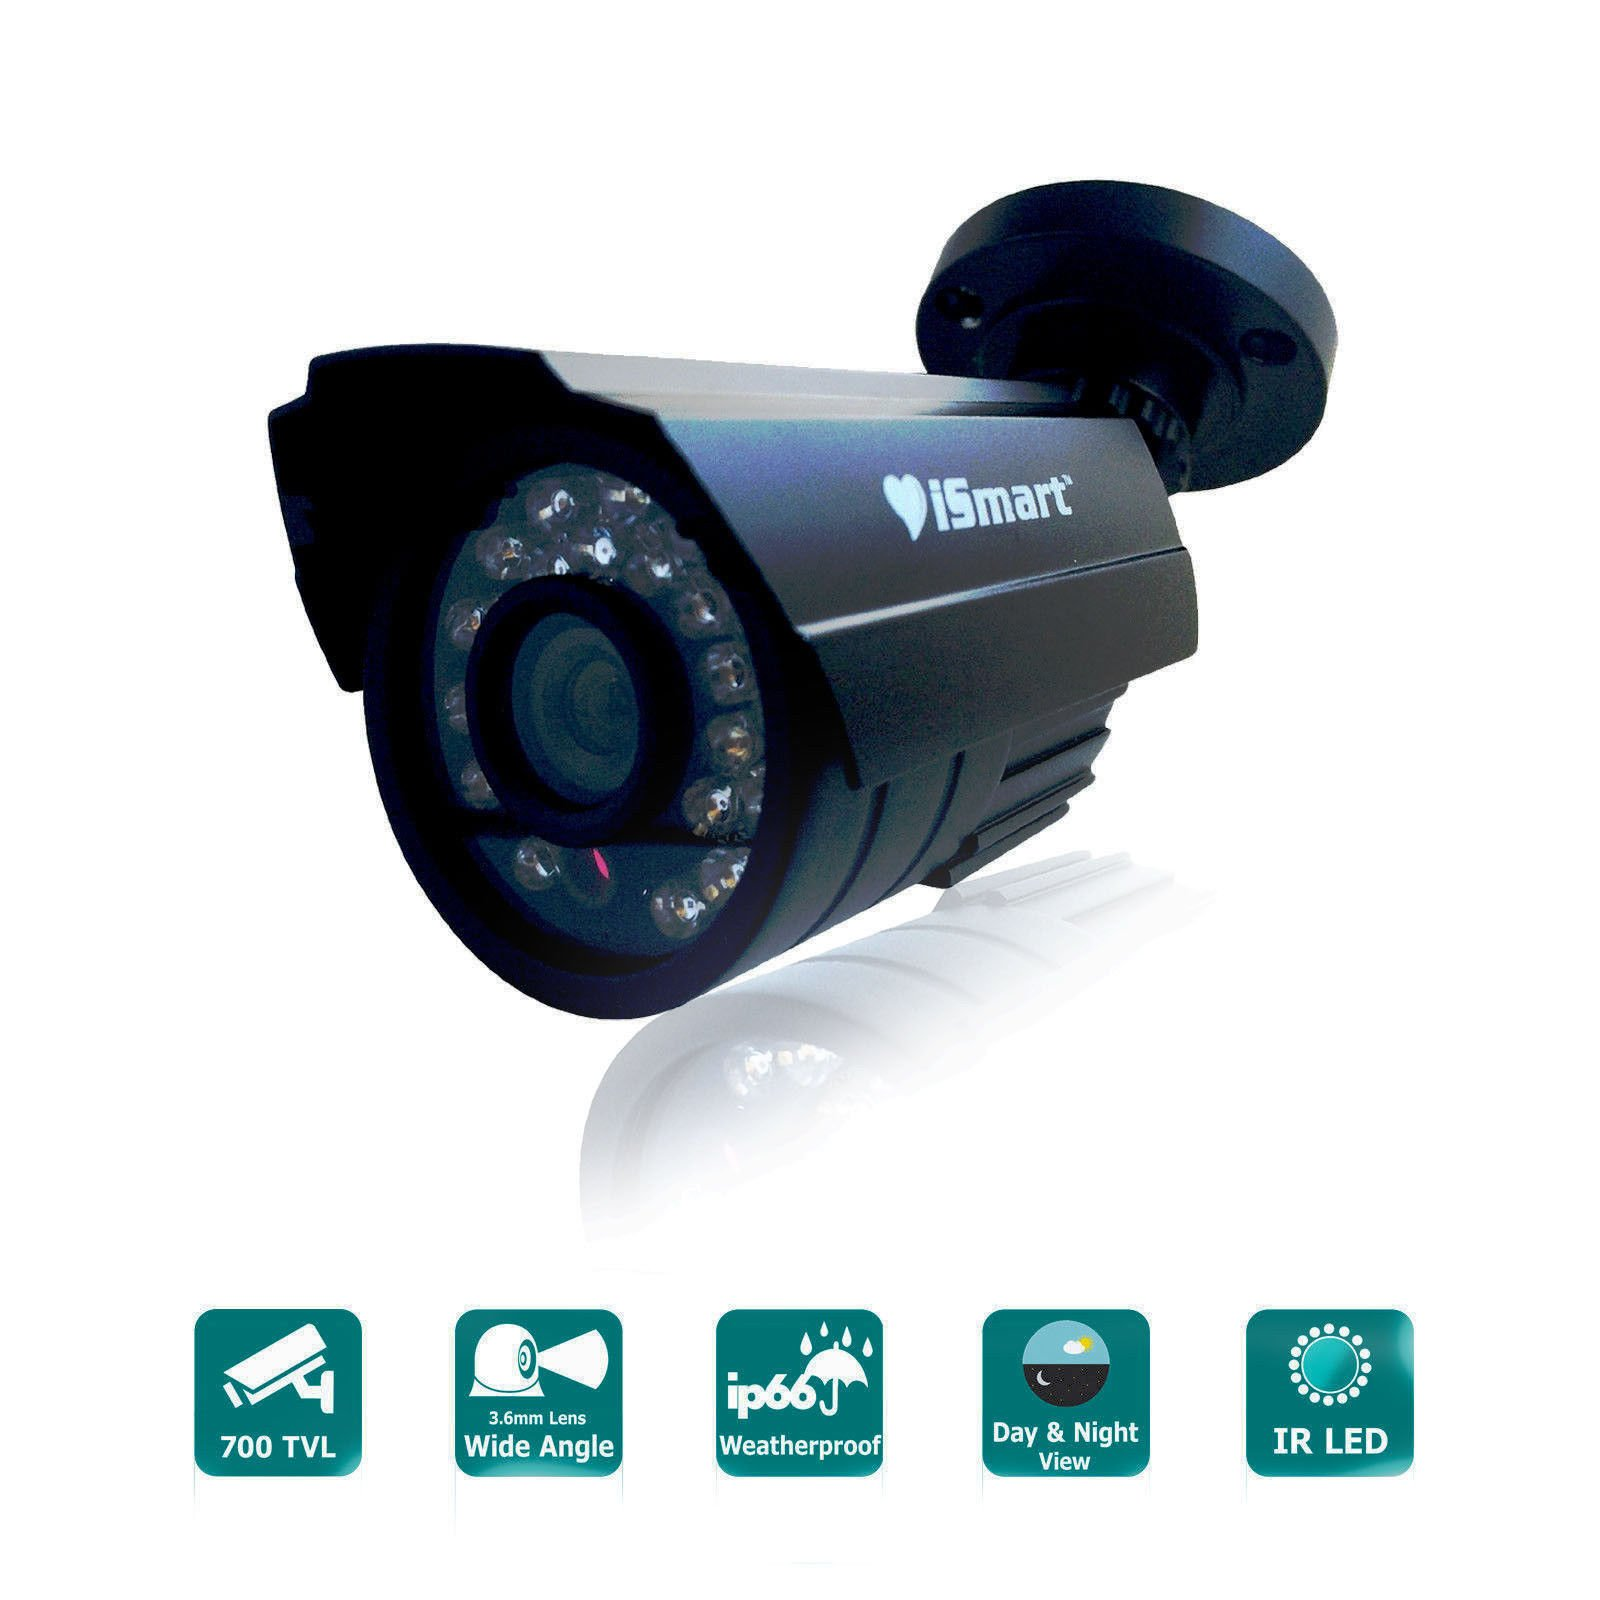 iSmart 700TVL IP66 CCTV Home Surveillance Weatherproof 3.6mm Lens with IR Cut Bullet Security Camera 24PCS Infrared LEDs, 60ft IR Distance, Aluminum Metal Housing (Black) C1030DP7